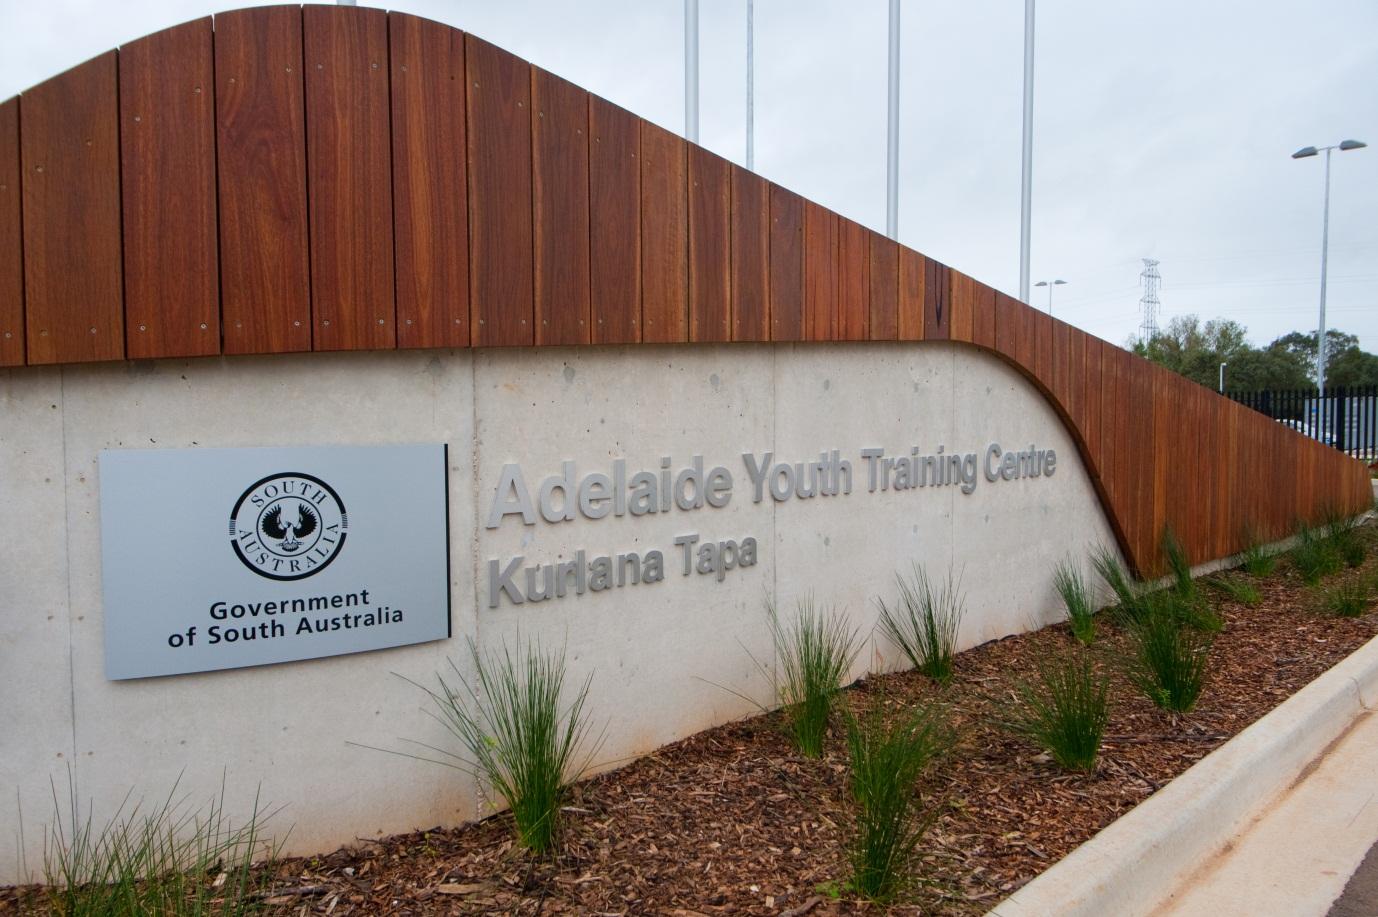 DHS - Adelaide Youth Training Centre (AYTC) - Kurlana Tapa